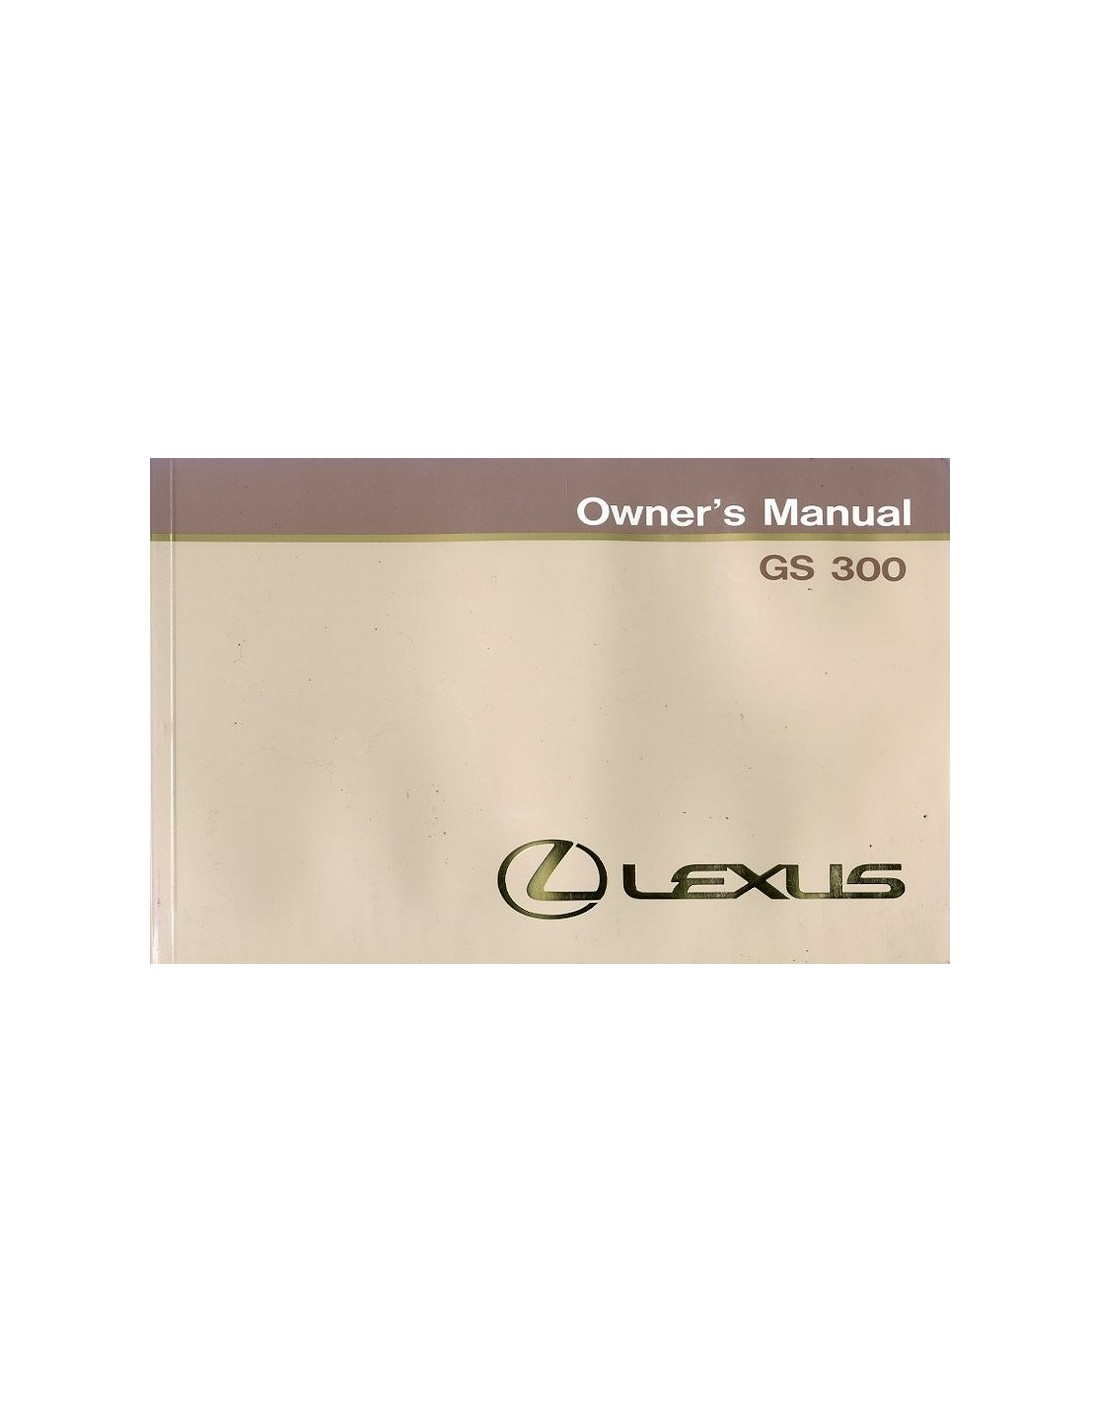 1994 lexus gs 300 owners manual handbook english rh autolit eu lexus es 300 owners manual 1996 2003 lexus is 300 owners manual